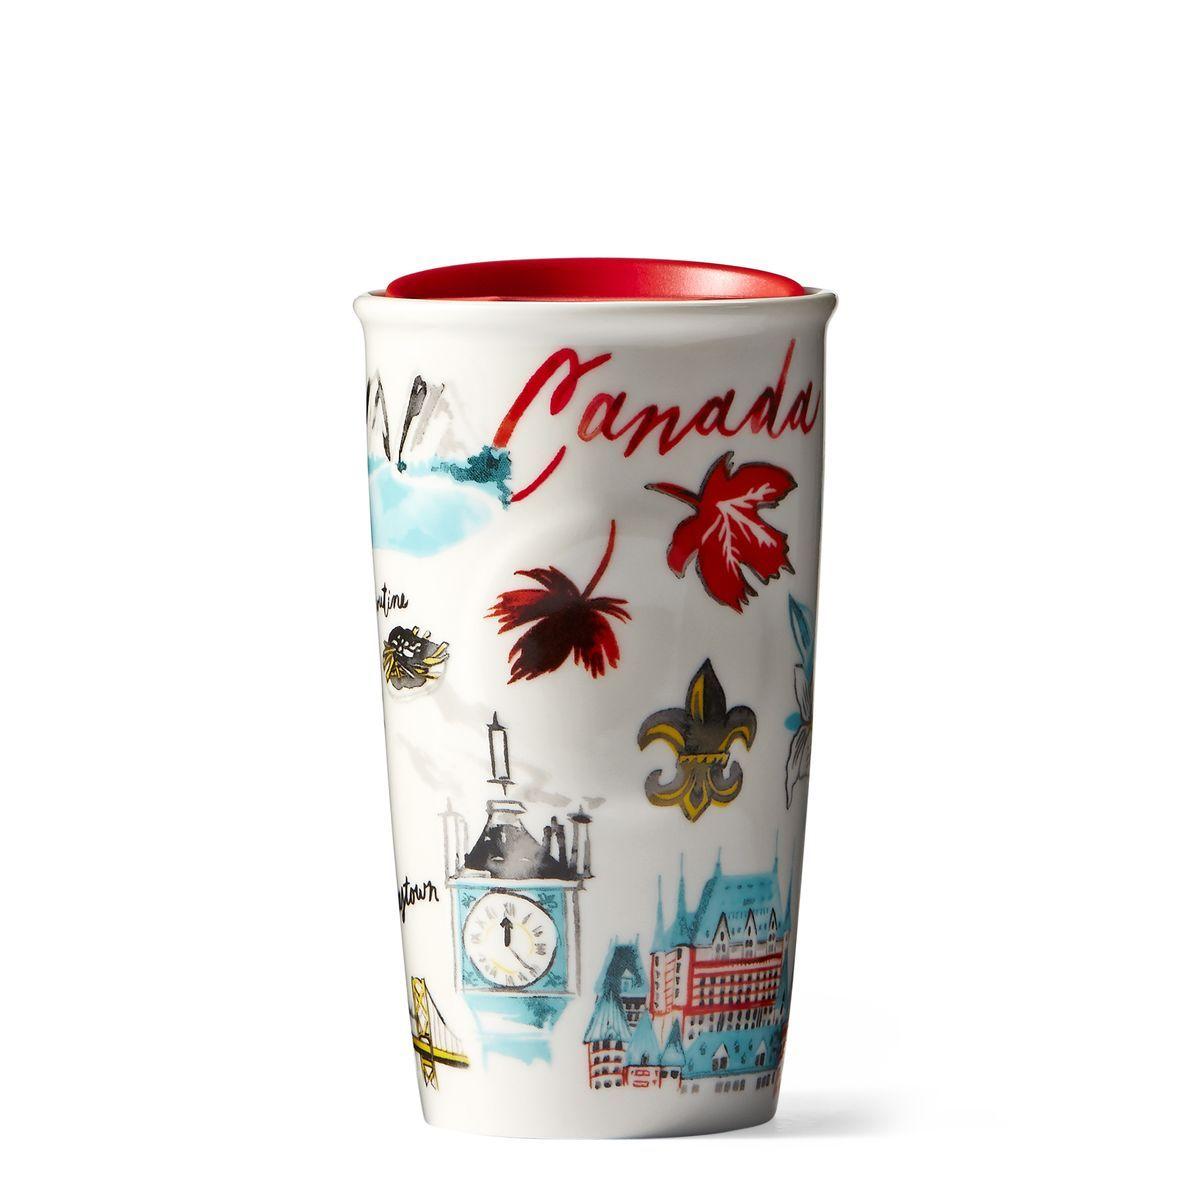 A double-walled ceramic mug celebrating iconic images and ...